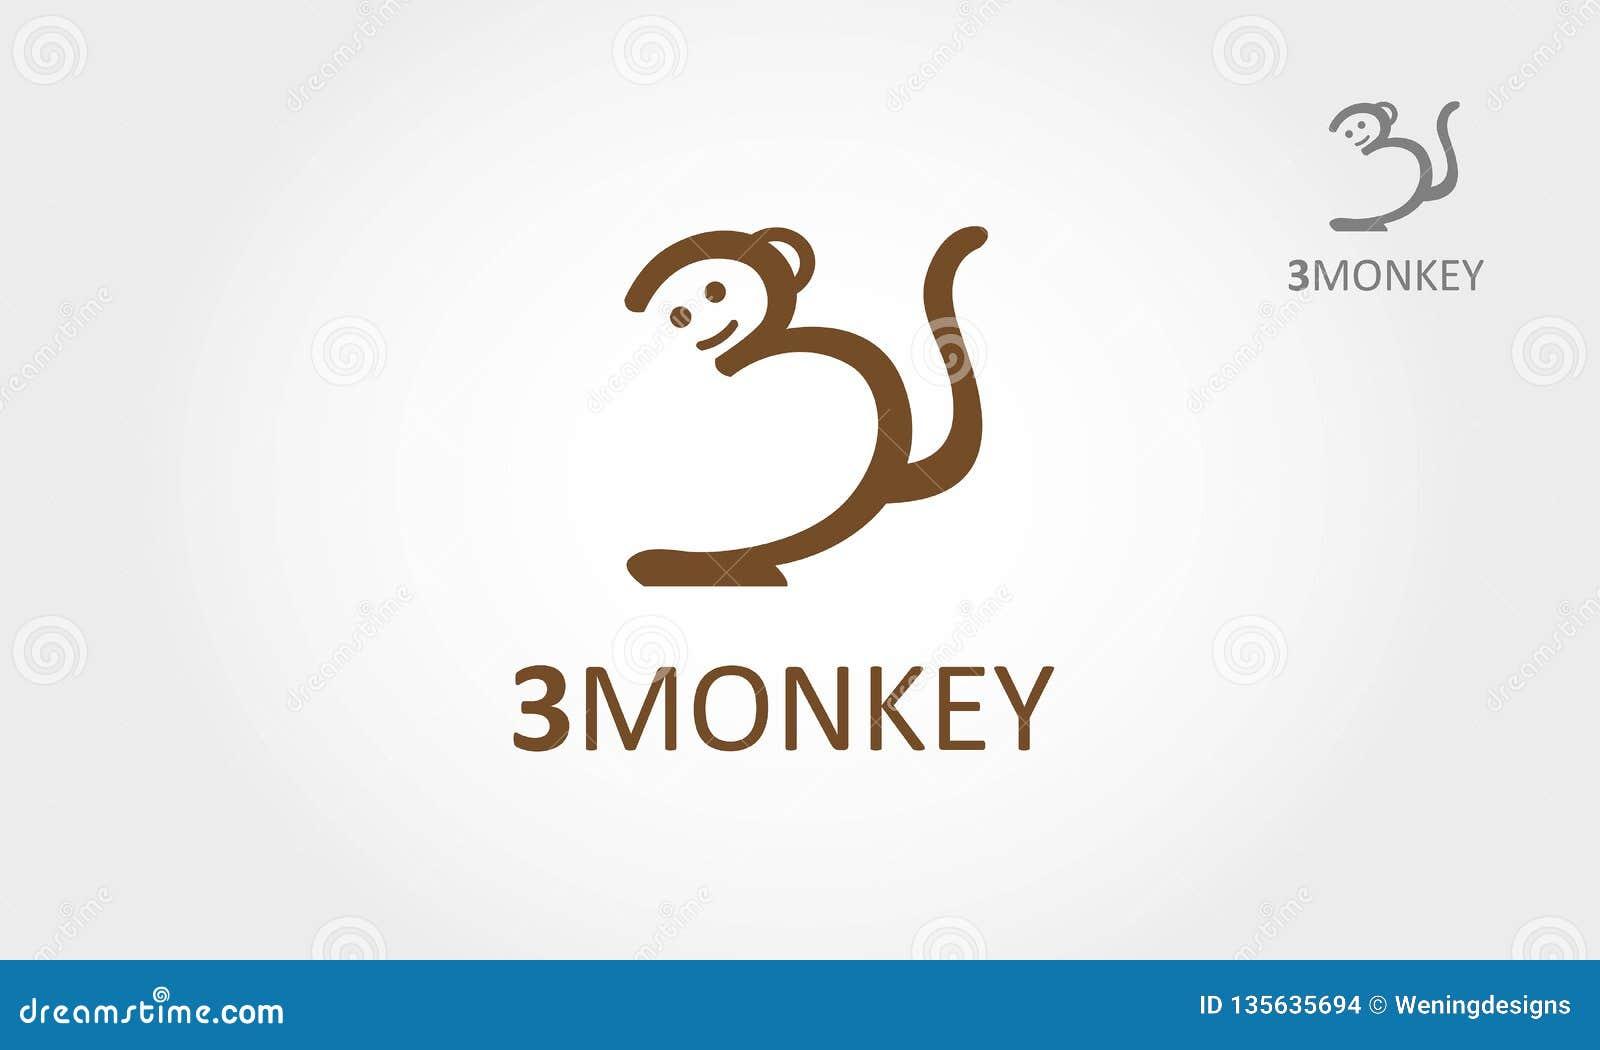 Logo de la bande dessinée 3Monkey